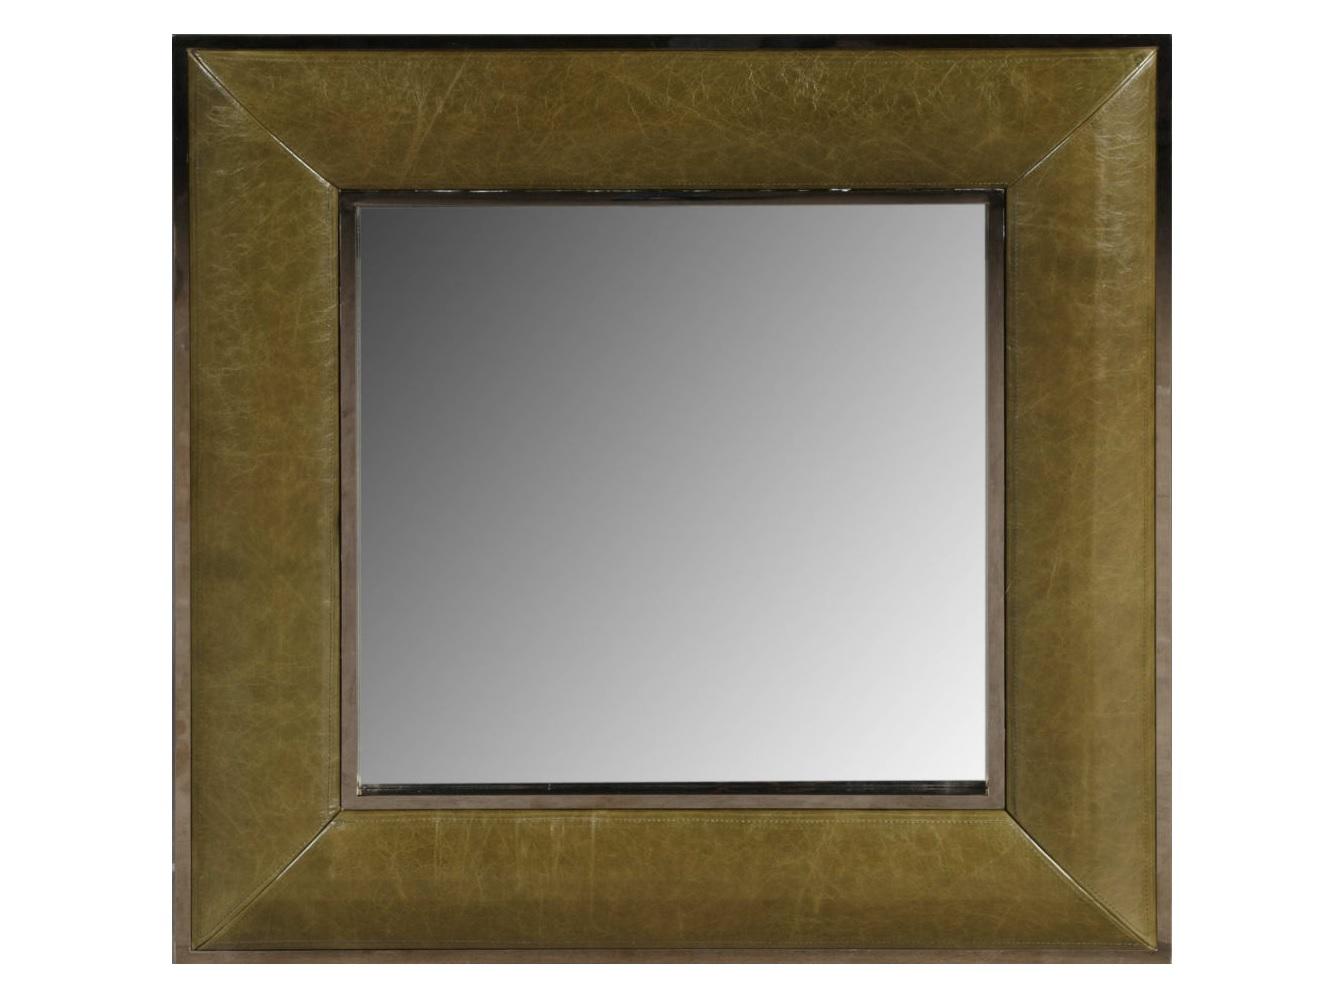 Зеркало Luxury &amp; NobilityНастенные зеркала<br><br><br>Material: Кожа<br>Ширина см: 90<br>Высота см: 90<br>Глубина см: 5